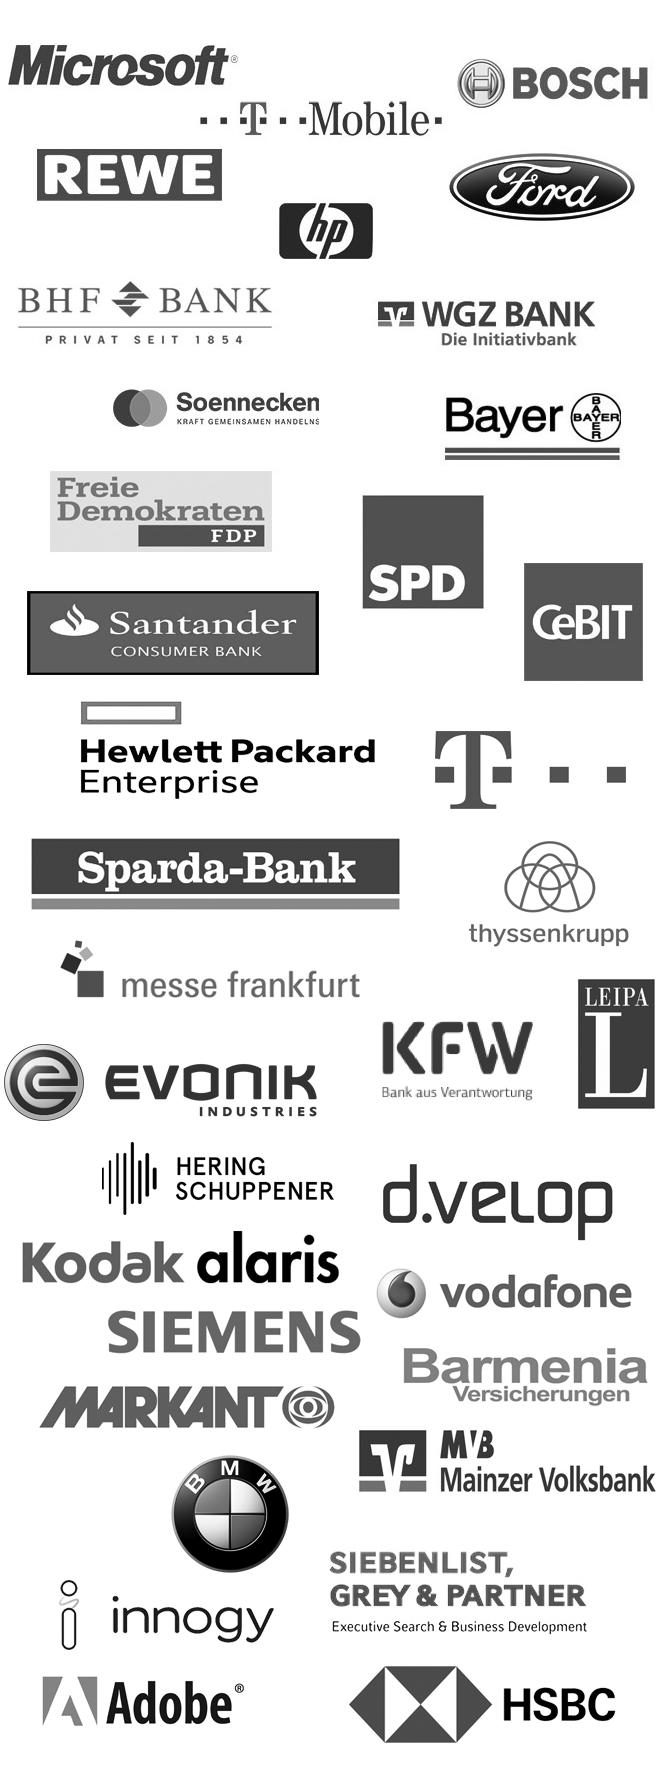 TELEKOM, MICROSOFT, BOSCH, REWE, FORD, HEWLETT-PACKARD, BHF BANK, T-MOBILE, WGZ BANK, NRW.BANK, SOENNECKEN, BAYER, FDP, SPD, CeBIT, SPARDA BANK, MESSE FRANKFURT, KREDITANSTALT FÜR WIEDERAUFBAU (KFW), THYSSENKRUPP, LEIPA, EVONIK INDUSTRIES, SANTANDER BANK